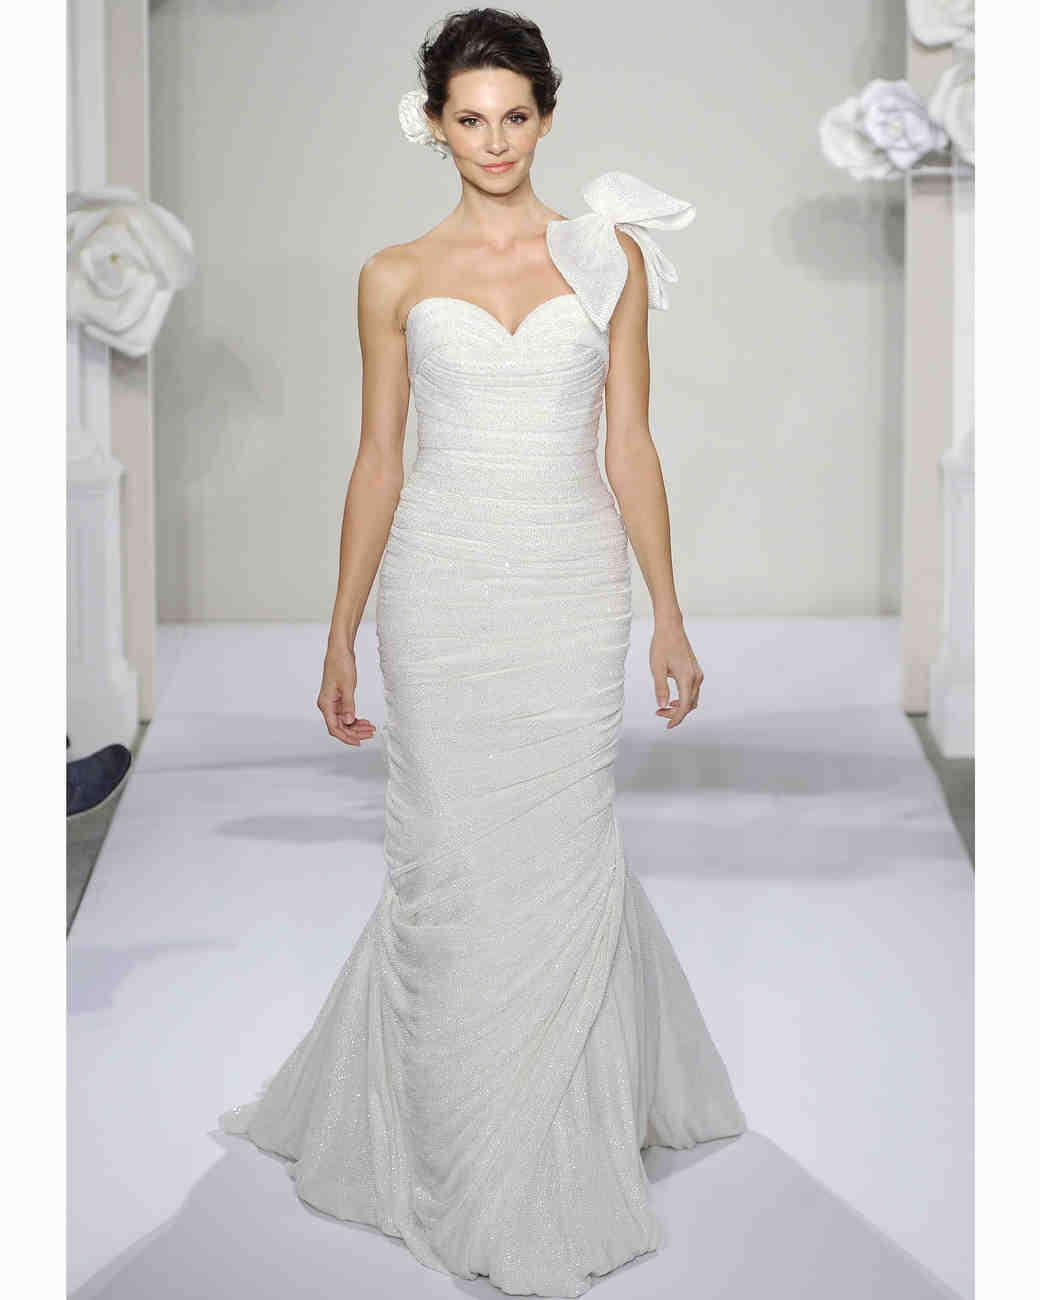 One-Shoulder Wedding Dresses, Fall 2013